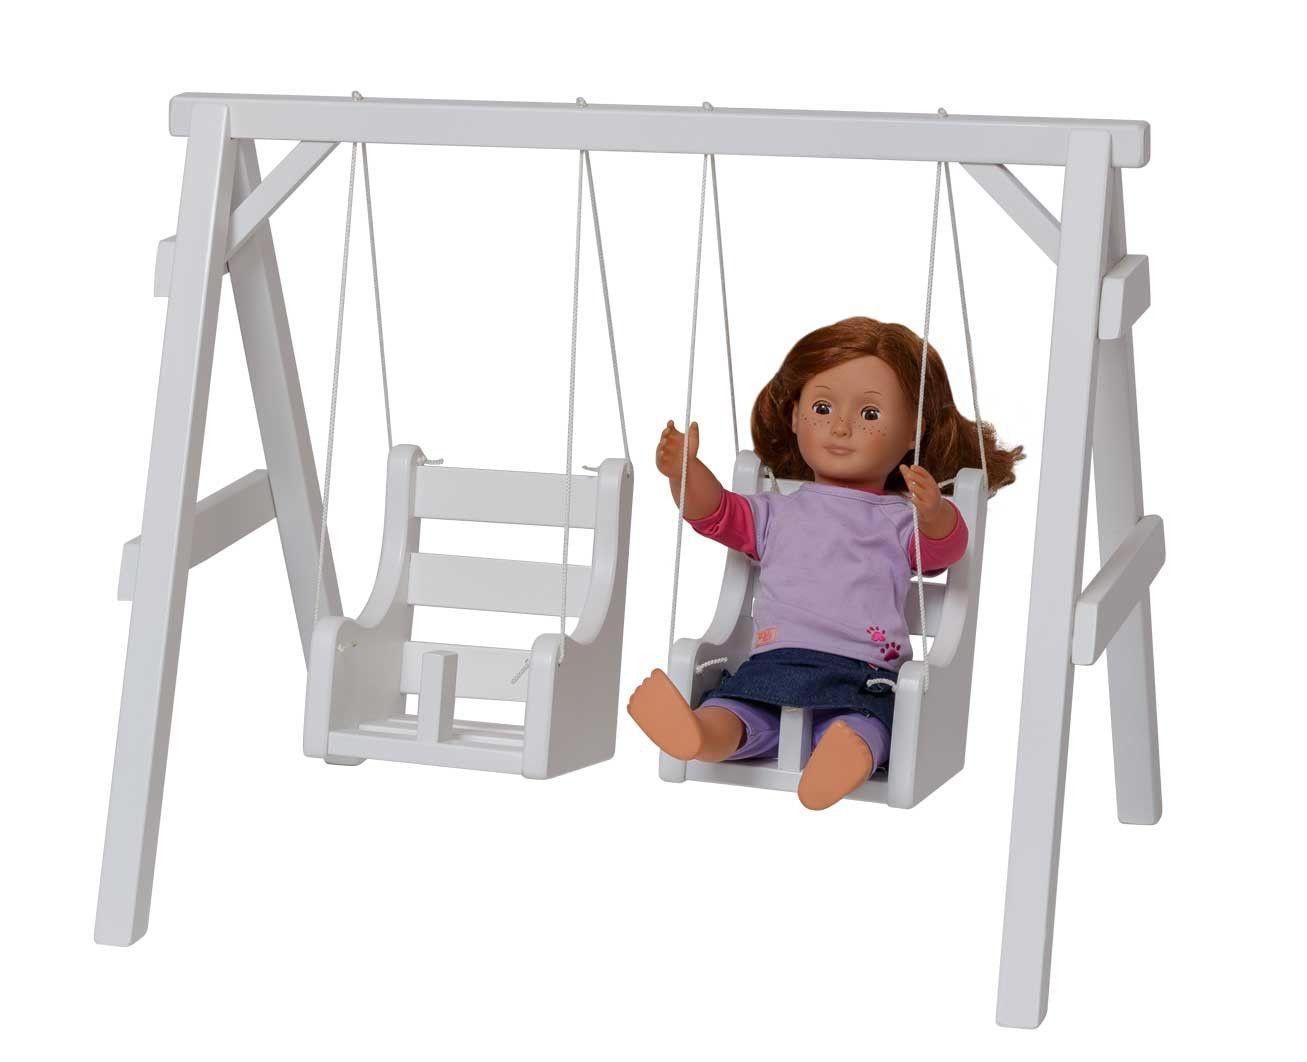 Baby Doll Playground Swing Set Amish Handmade Toy Swings